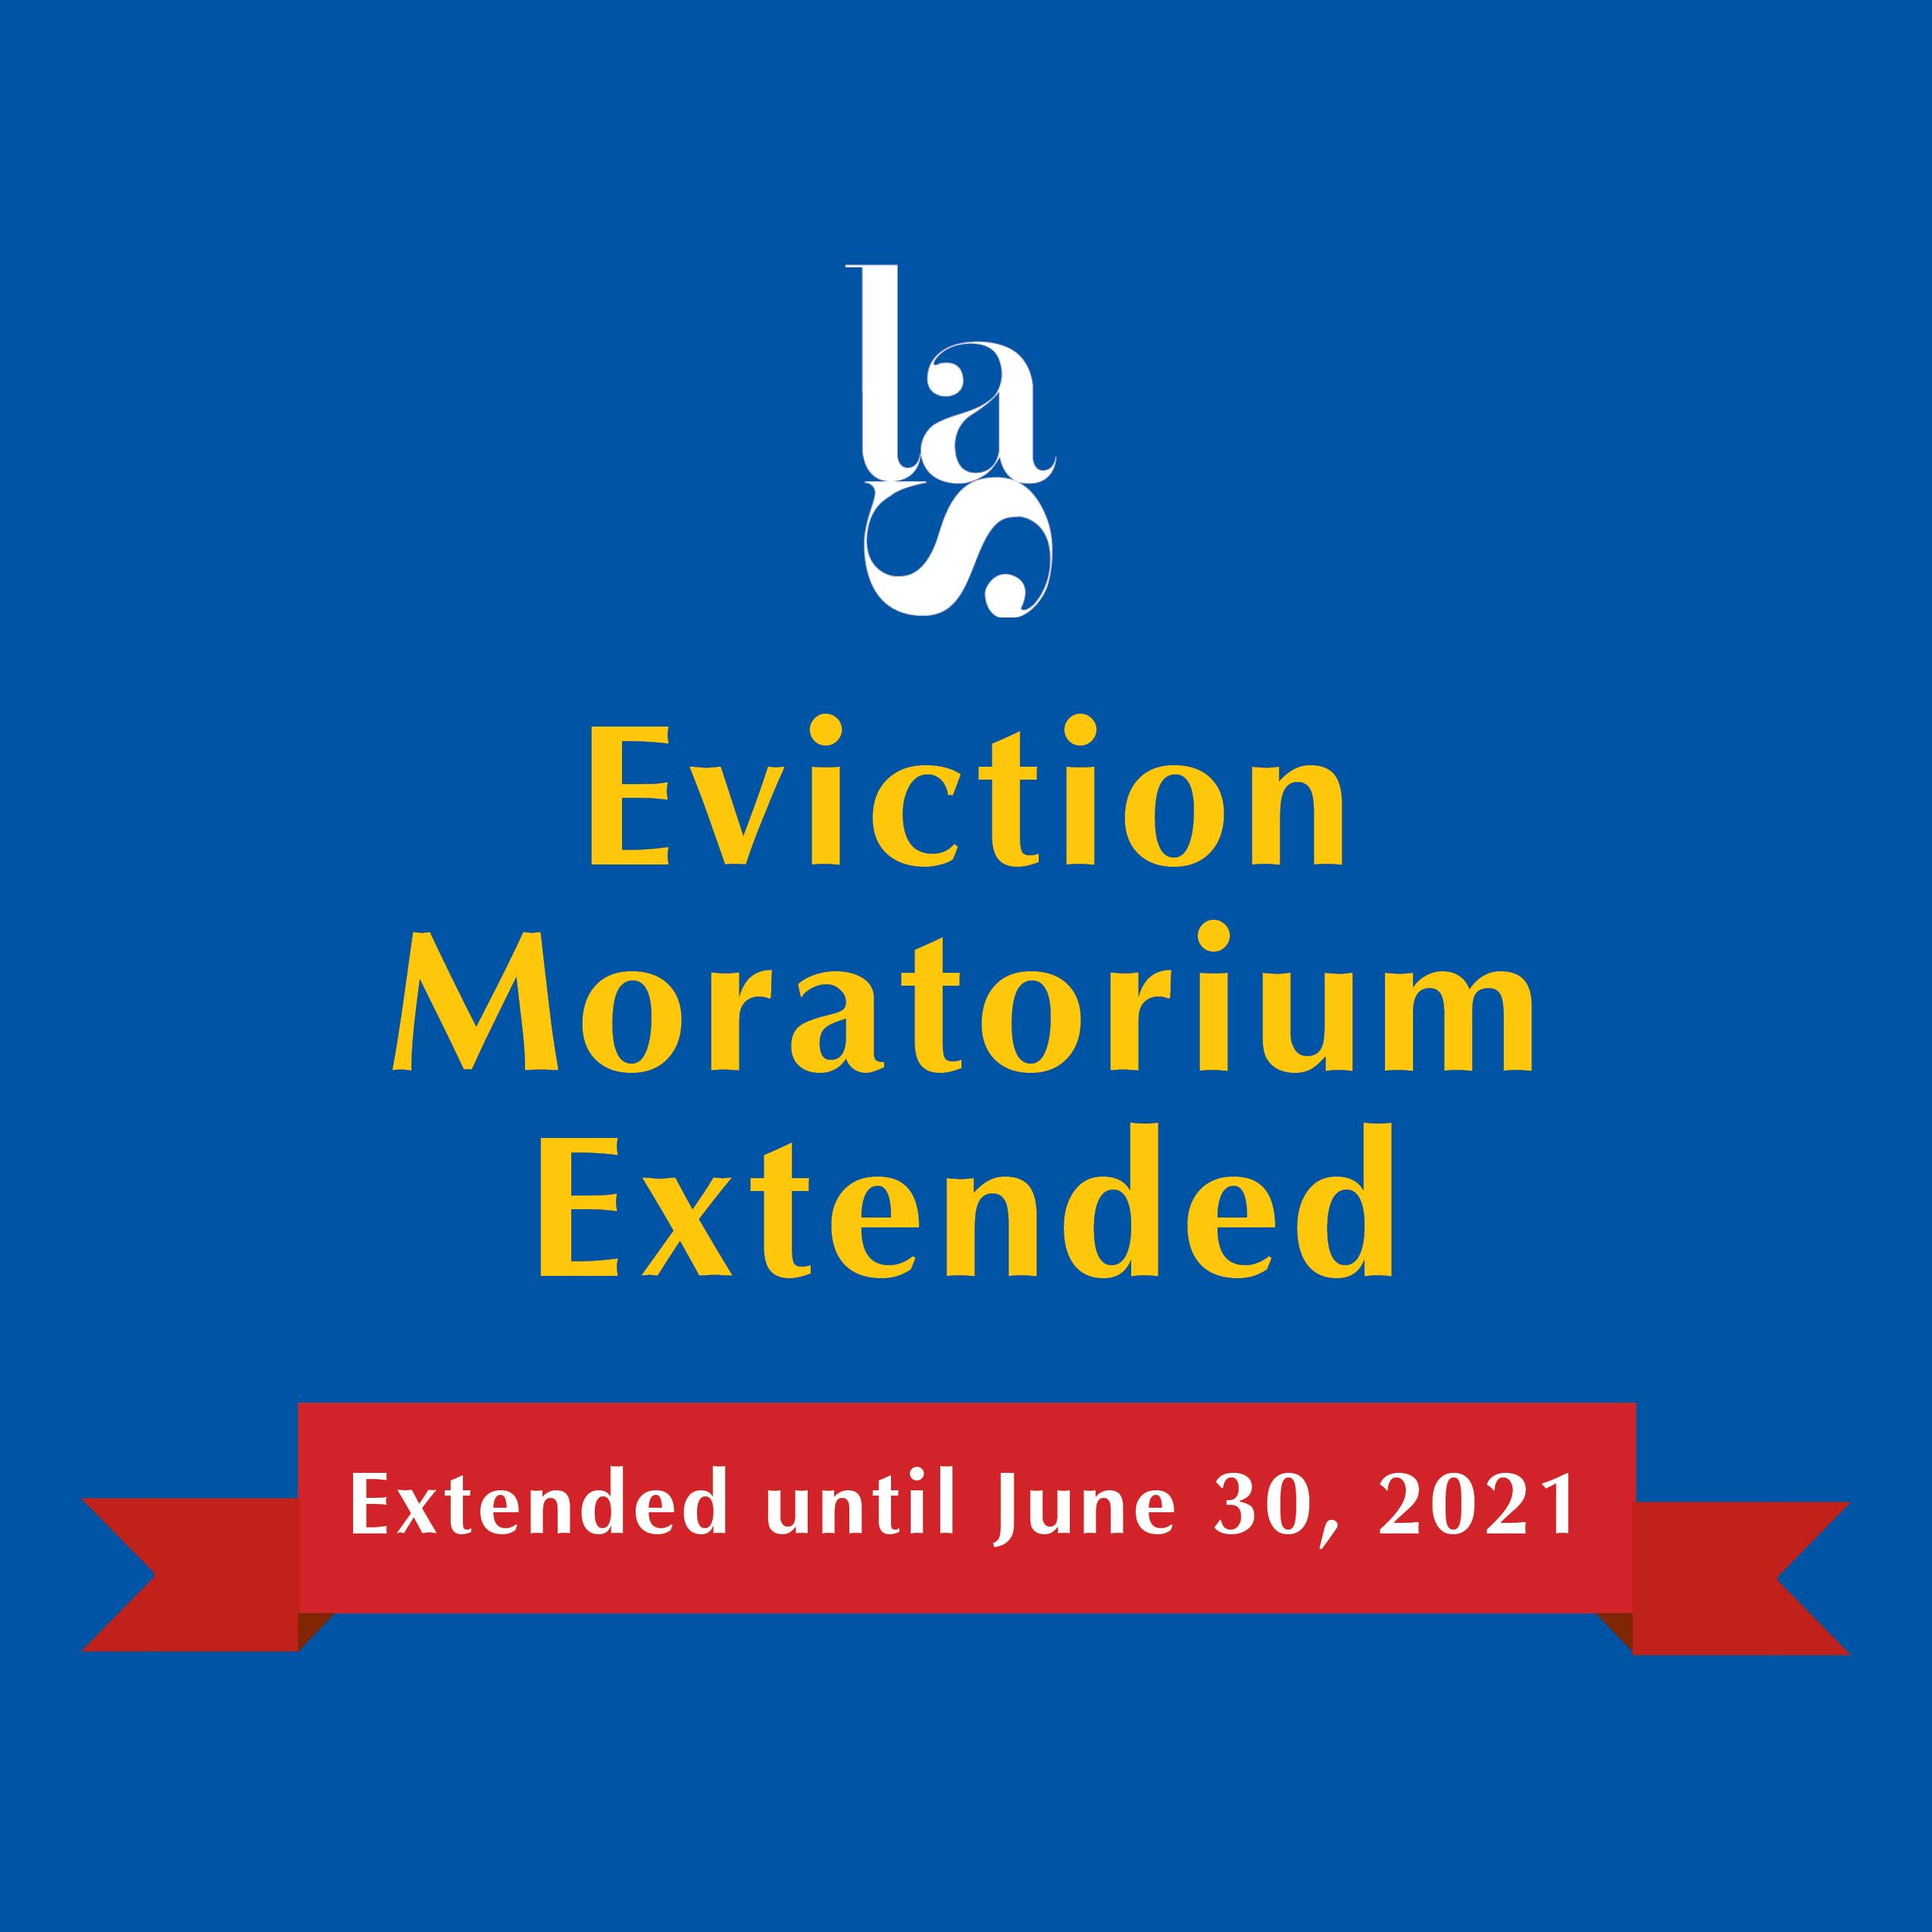 Eviction Moratorium Extended Until June 30, 2021